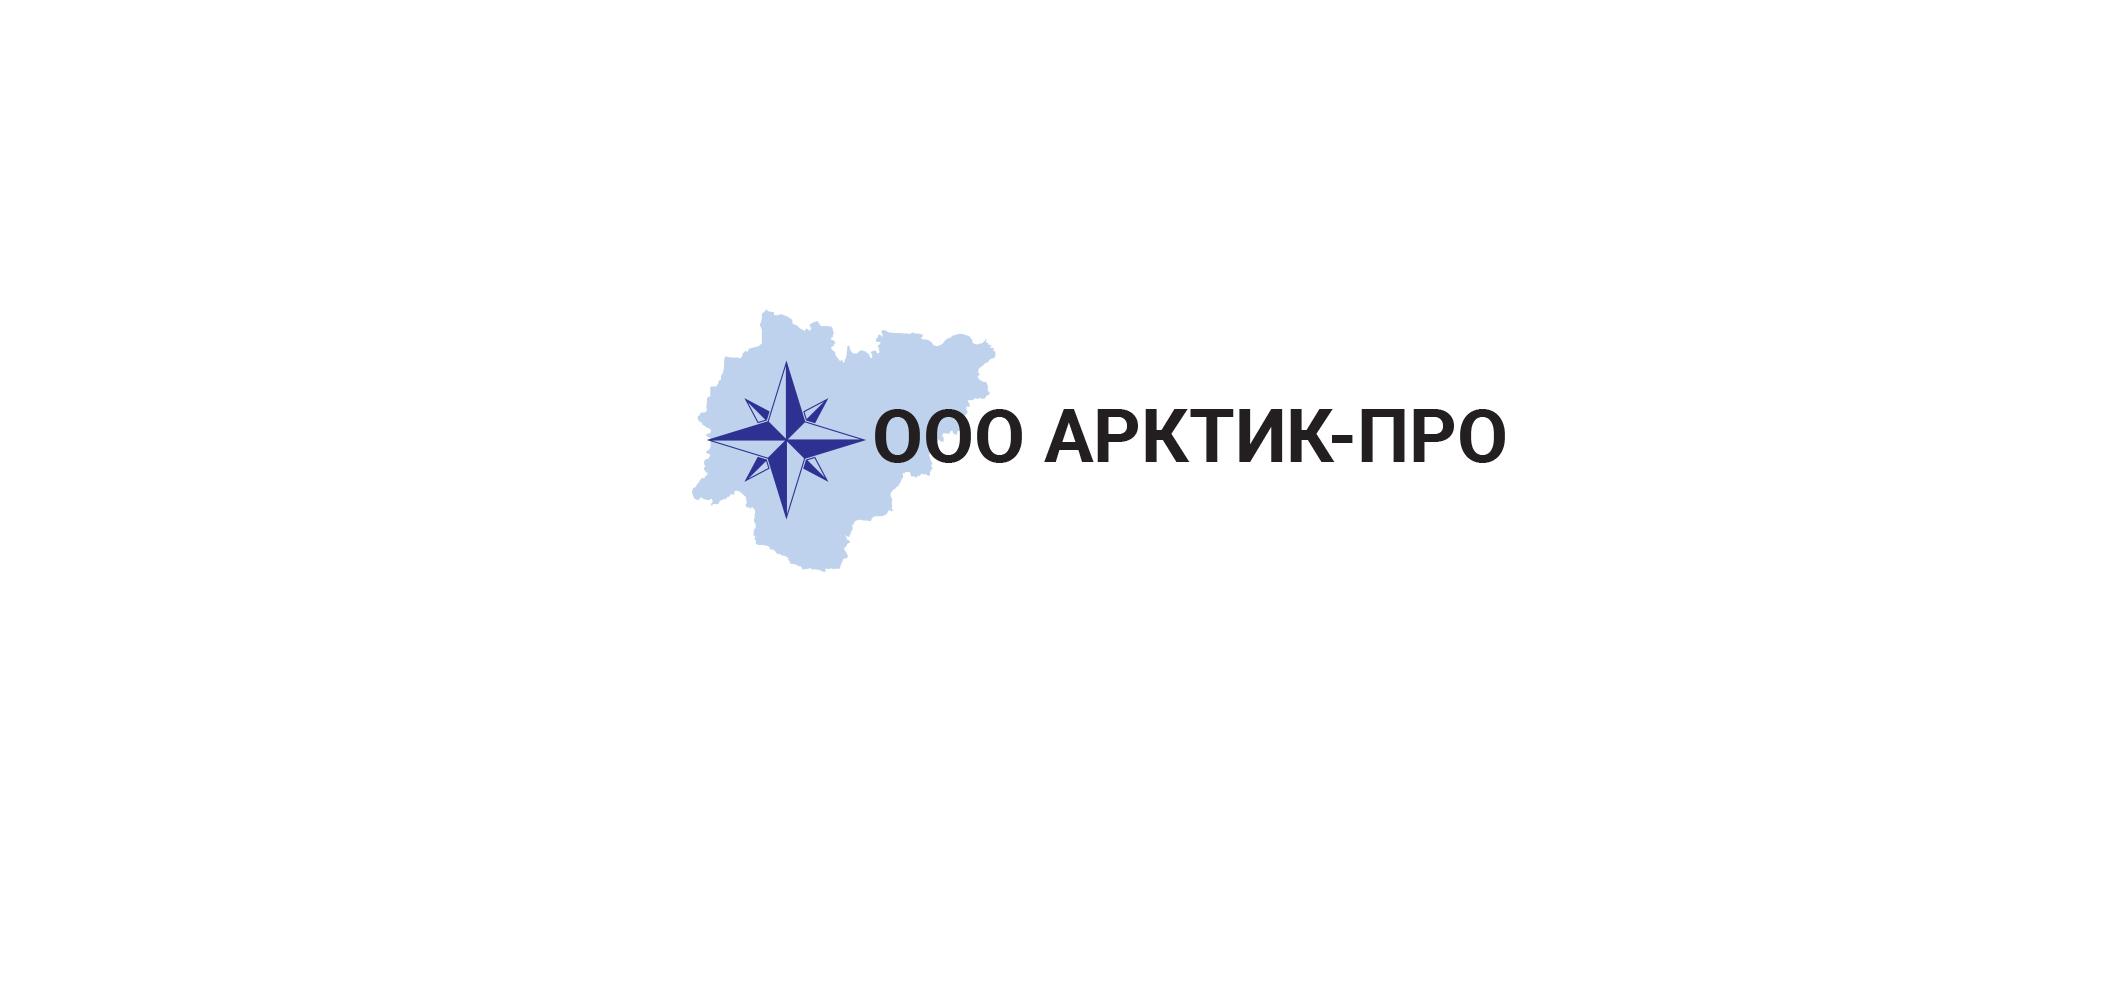 Арктик-Про